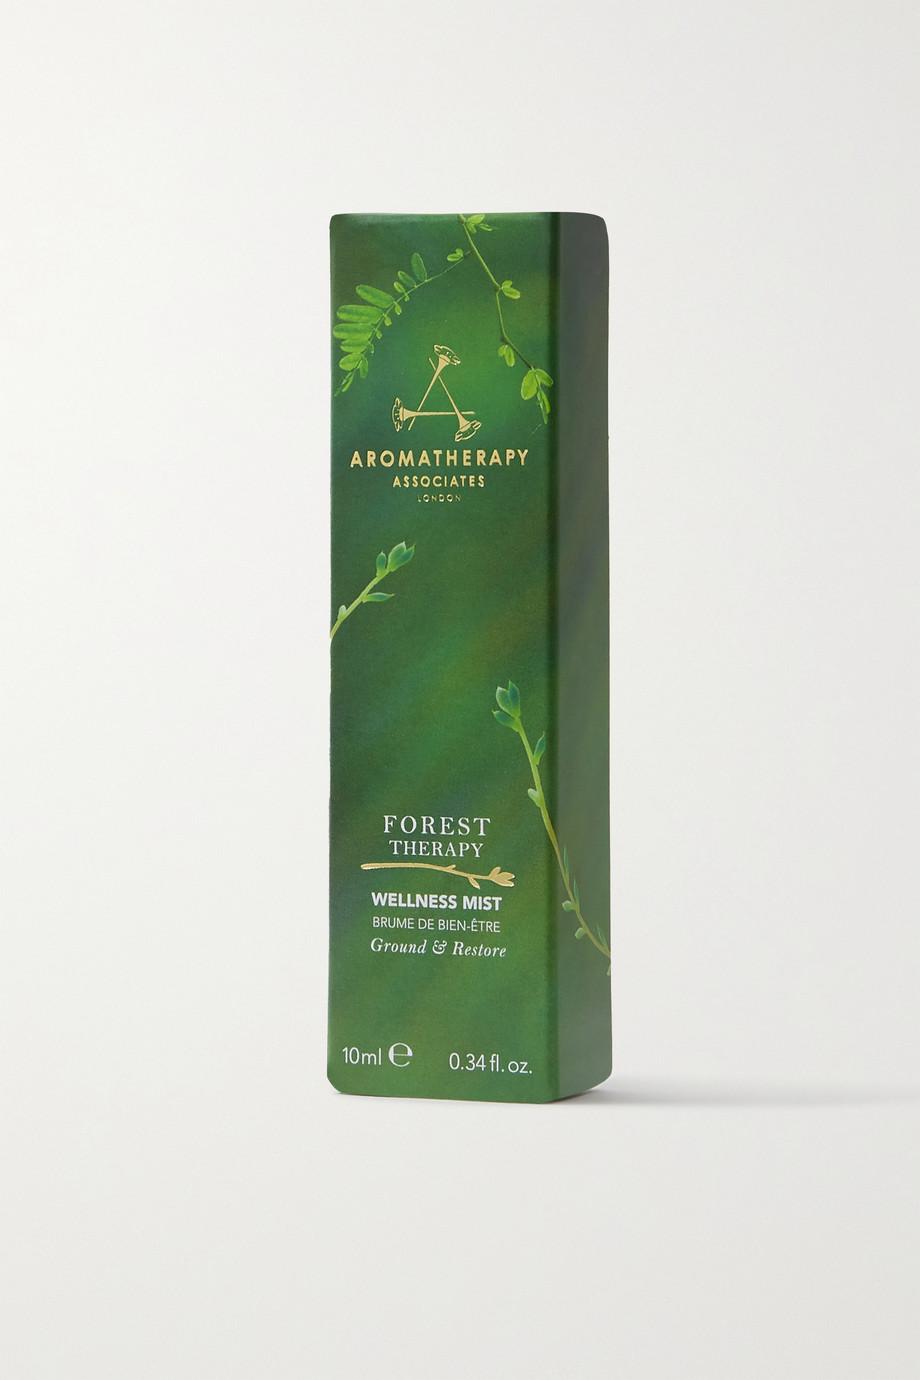 Aromatherapy Associates Forest Therapy Wellness Mist, 10ml